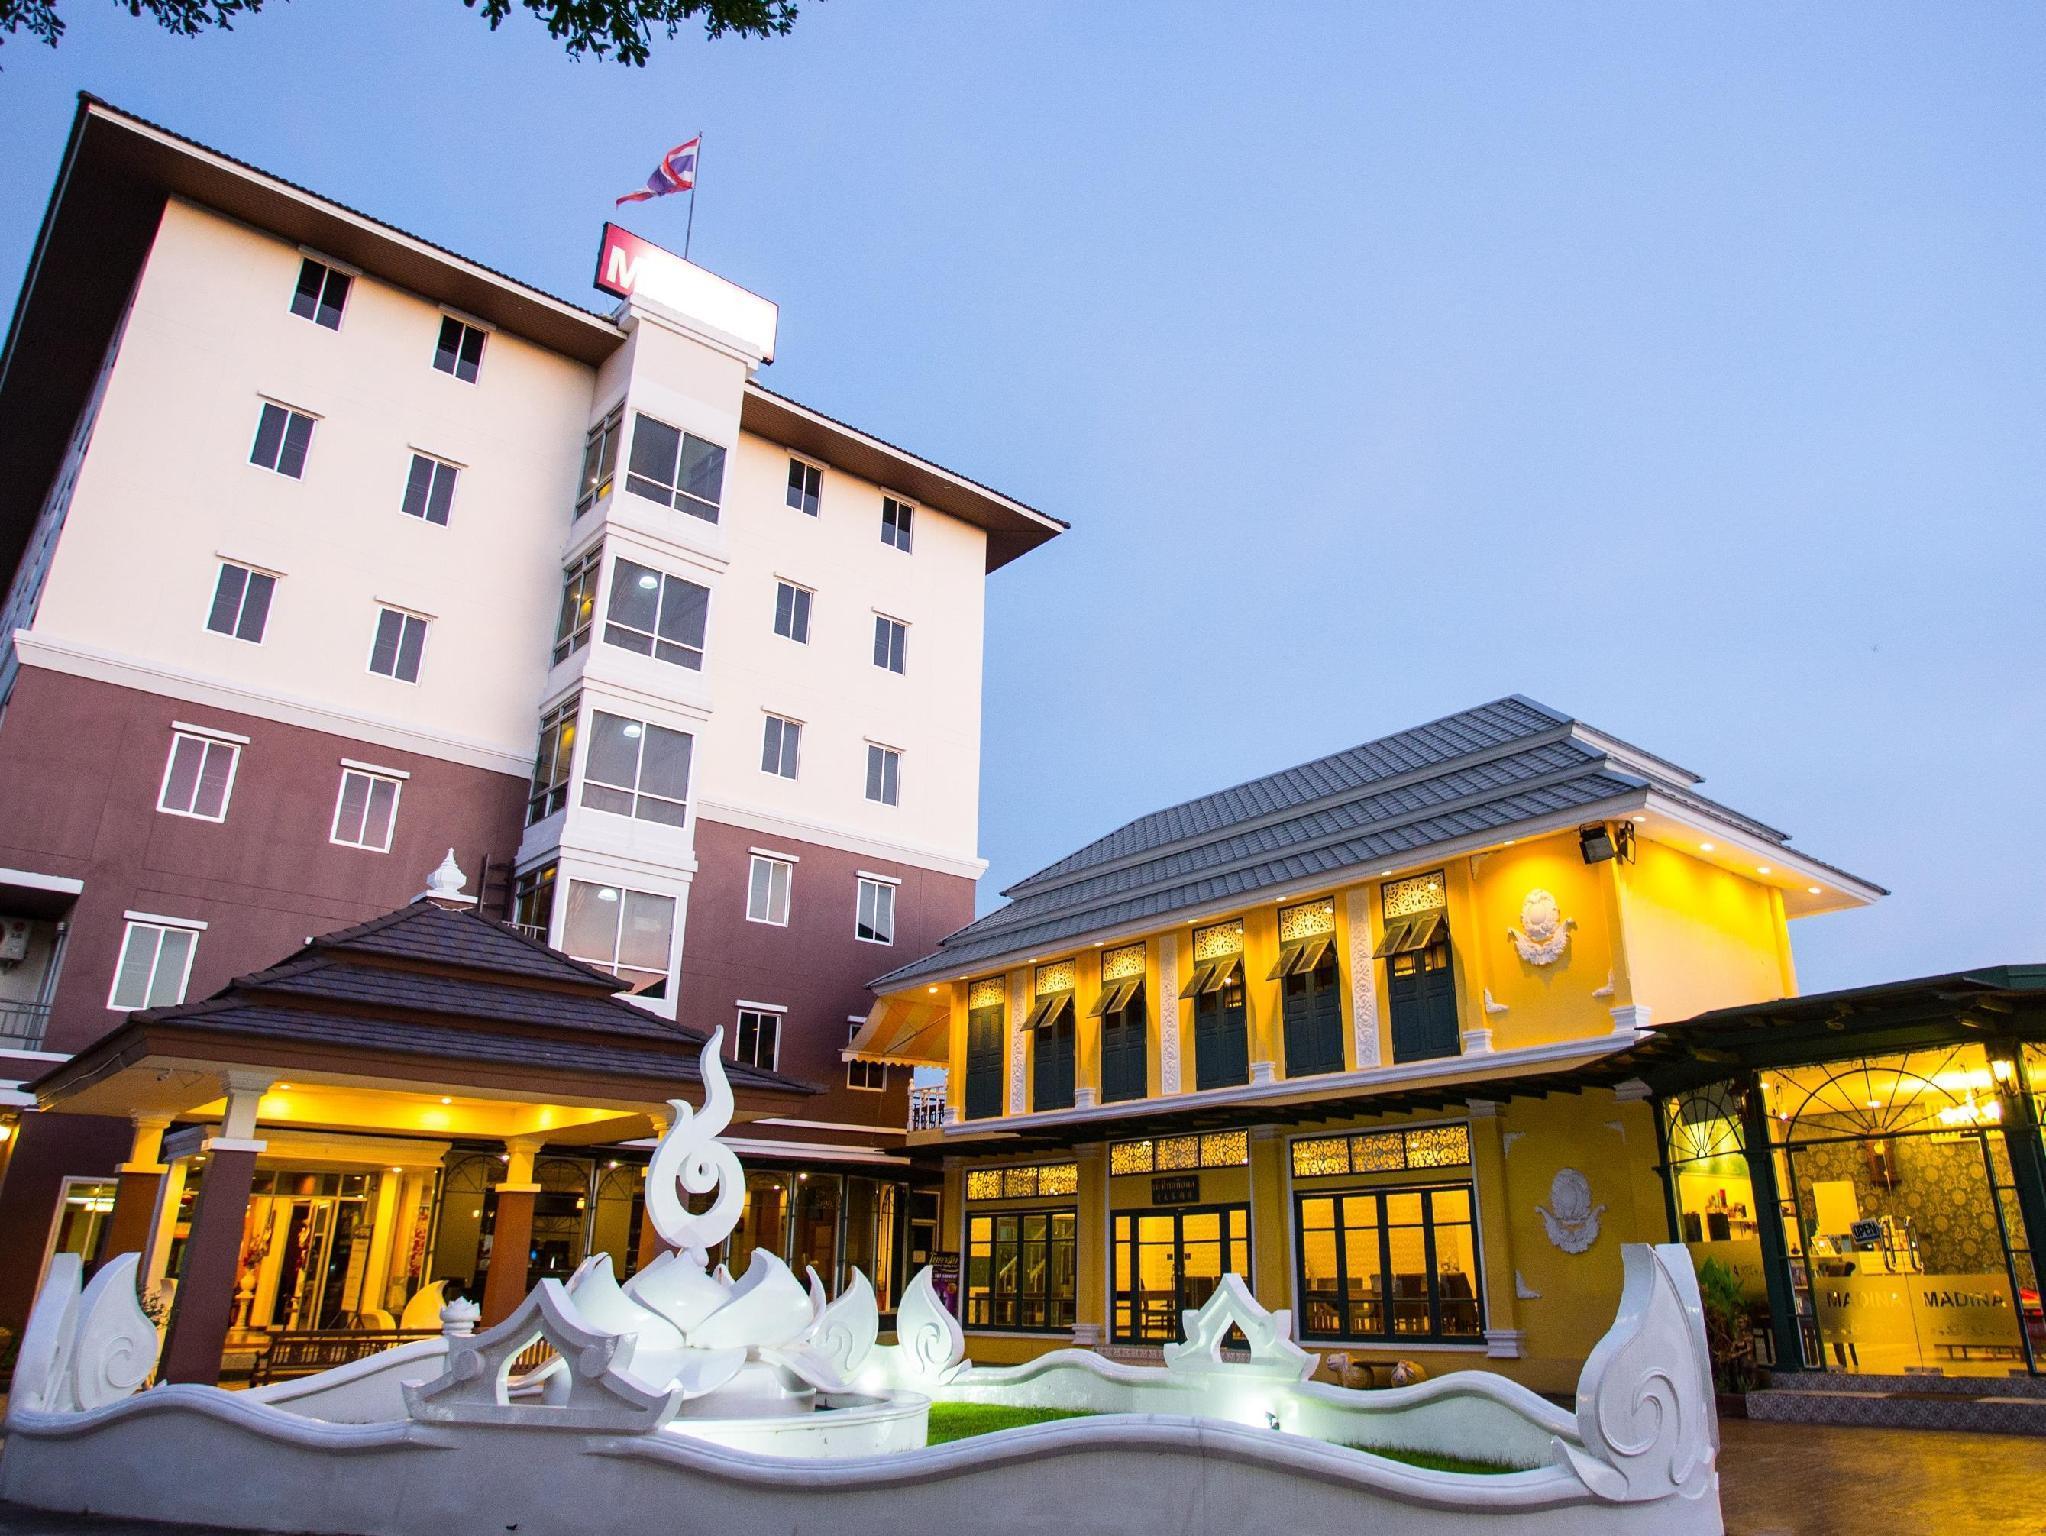 Madina Hotel โรงแรมมาดิน่า